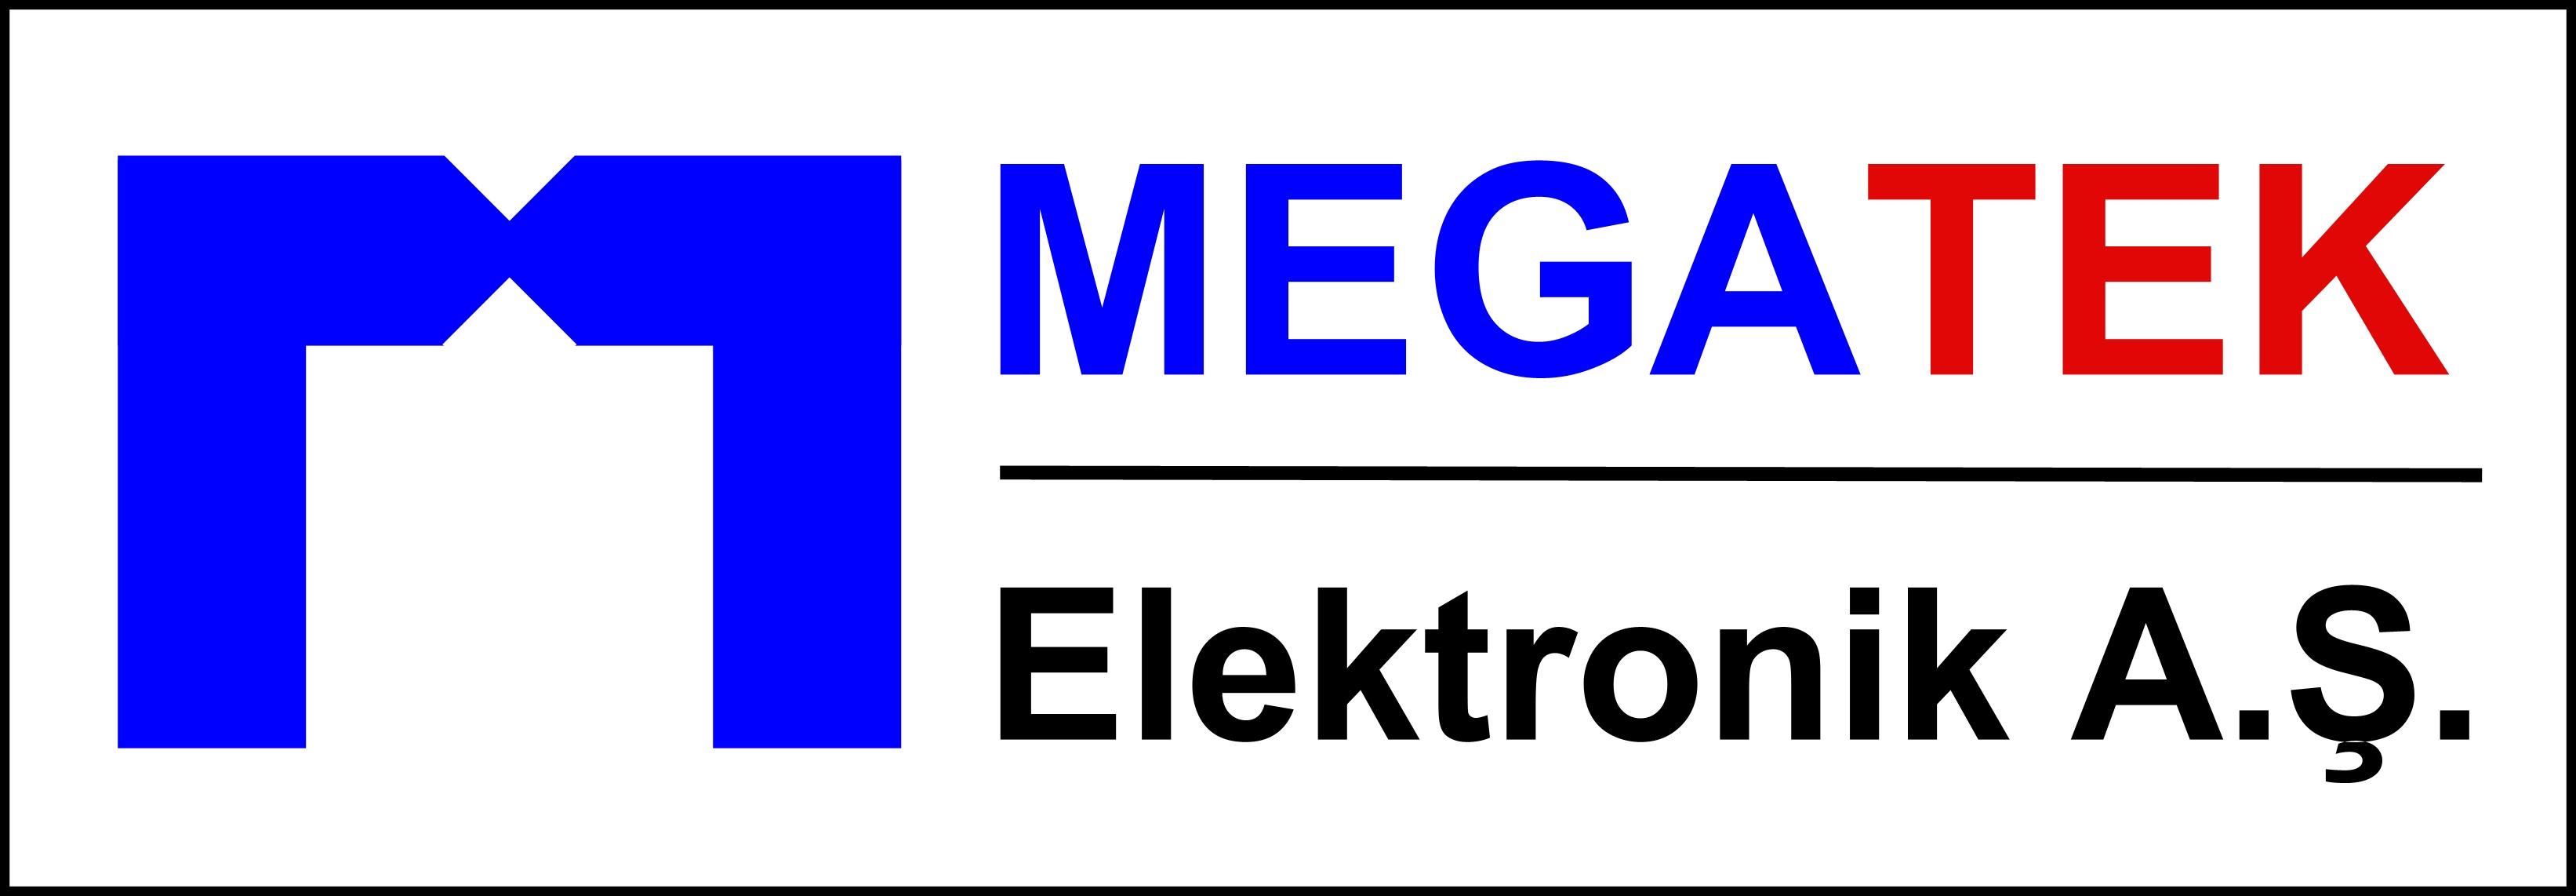 MEGATEK ELEKTRONİK ELEKTRİK SANAYİ VE TİCARET ANONİM ŞİRKETİ, MEGATEK ELEKTRONİK A.Ş. (Megatek Elektronik AS)